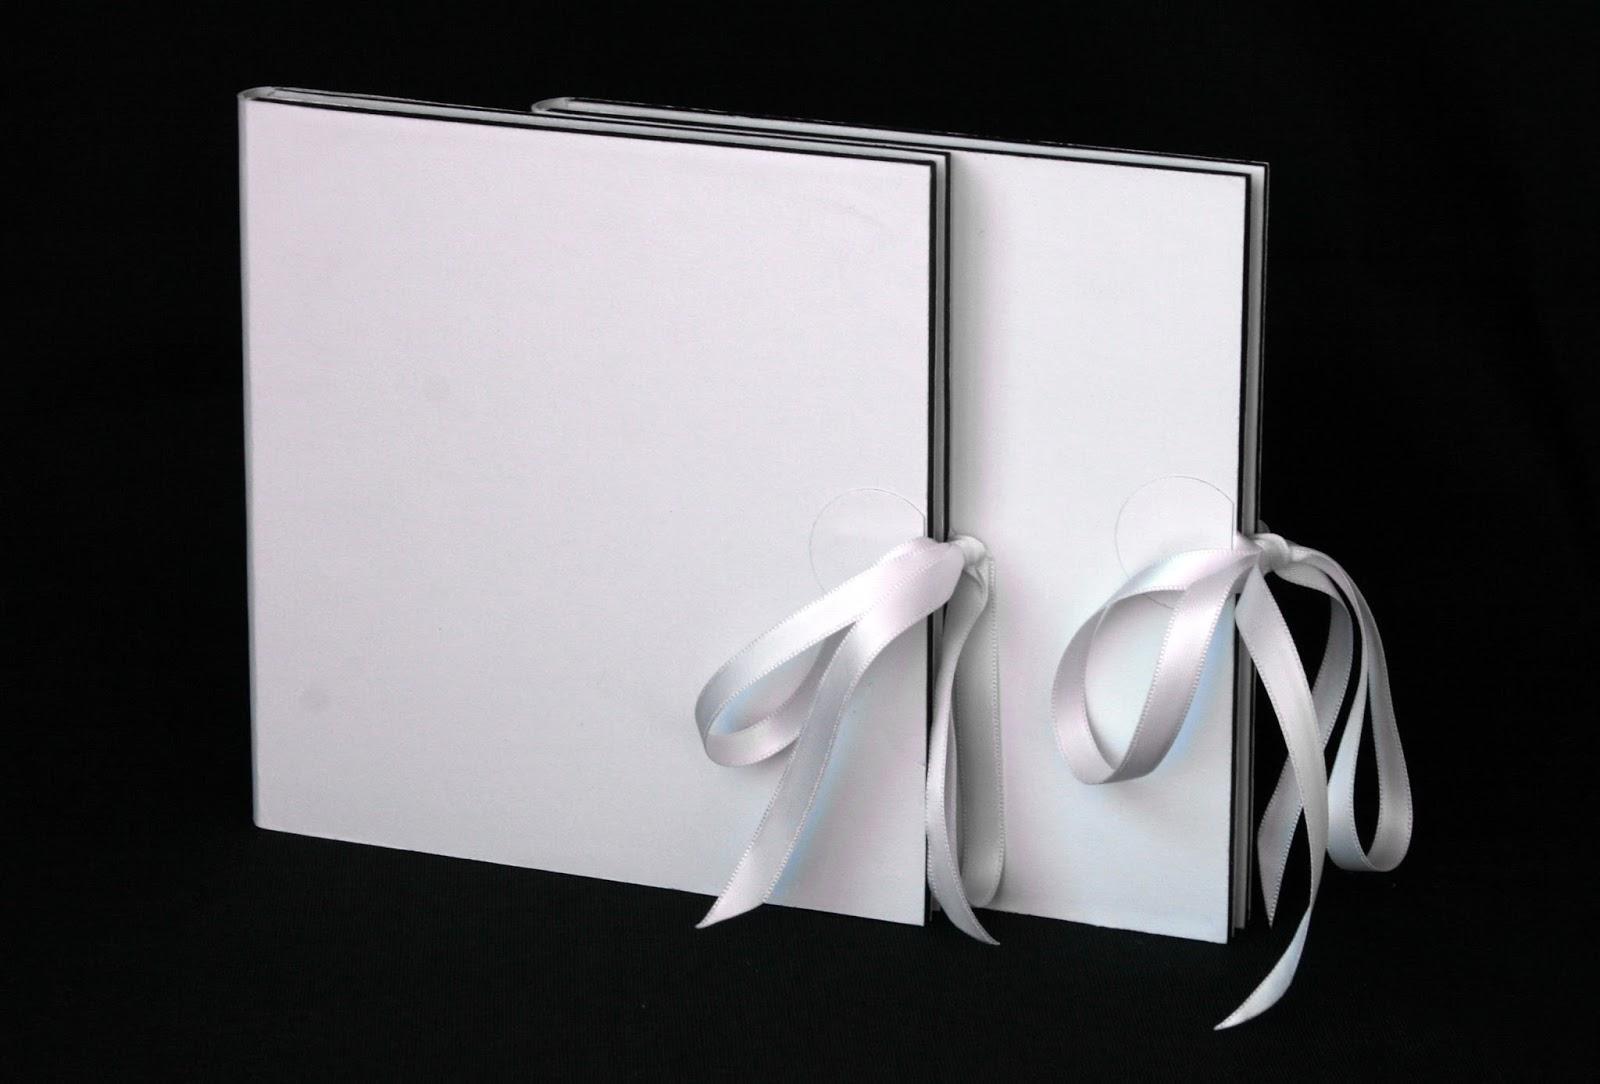 Pareja estuche 1 DVD  Basic Blanco